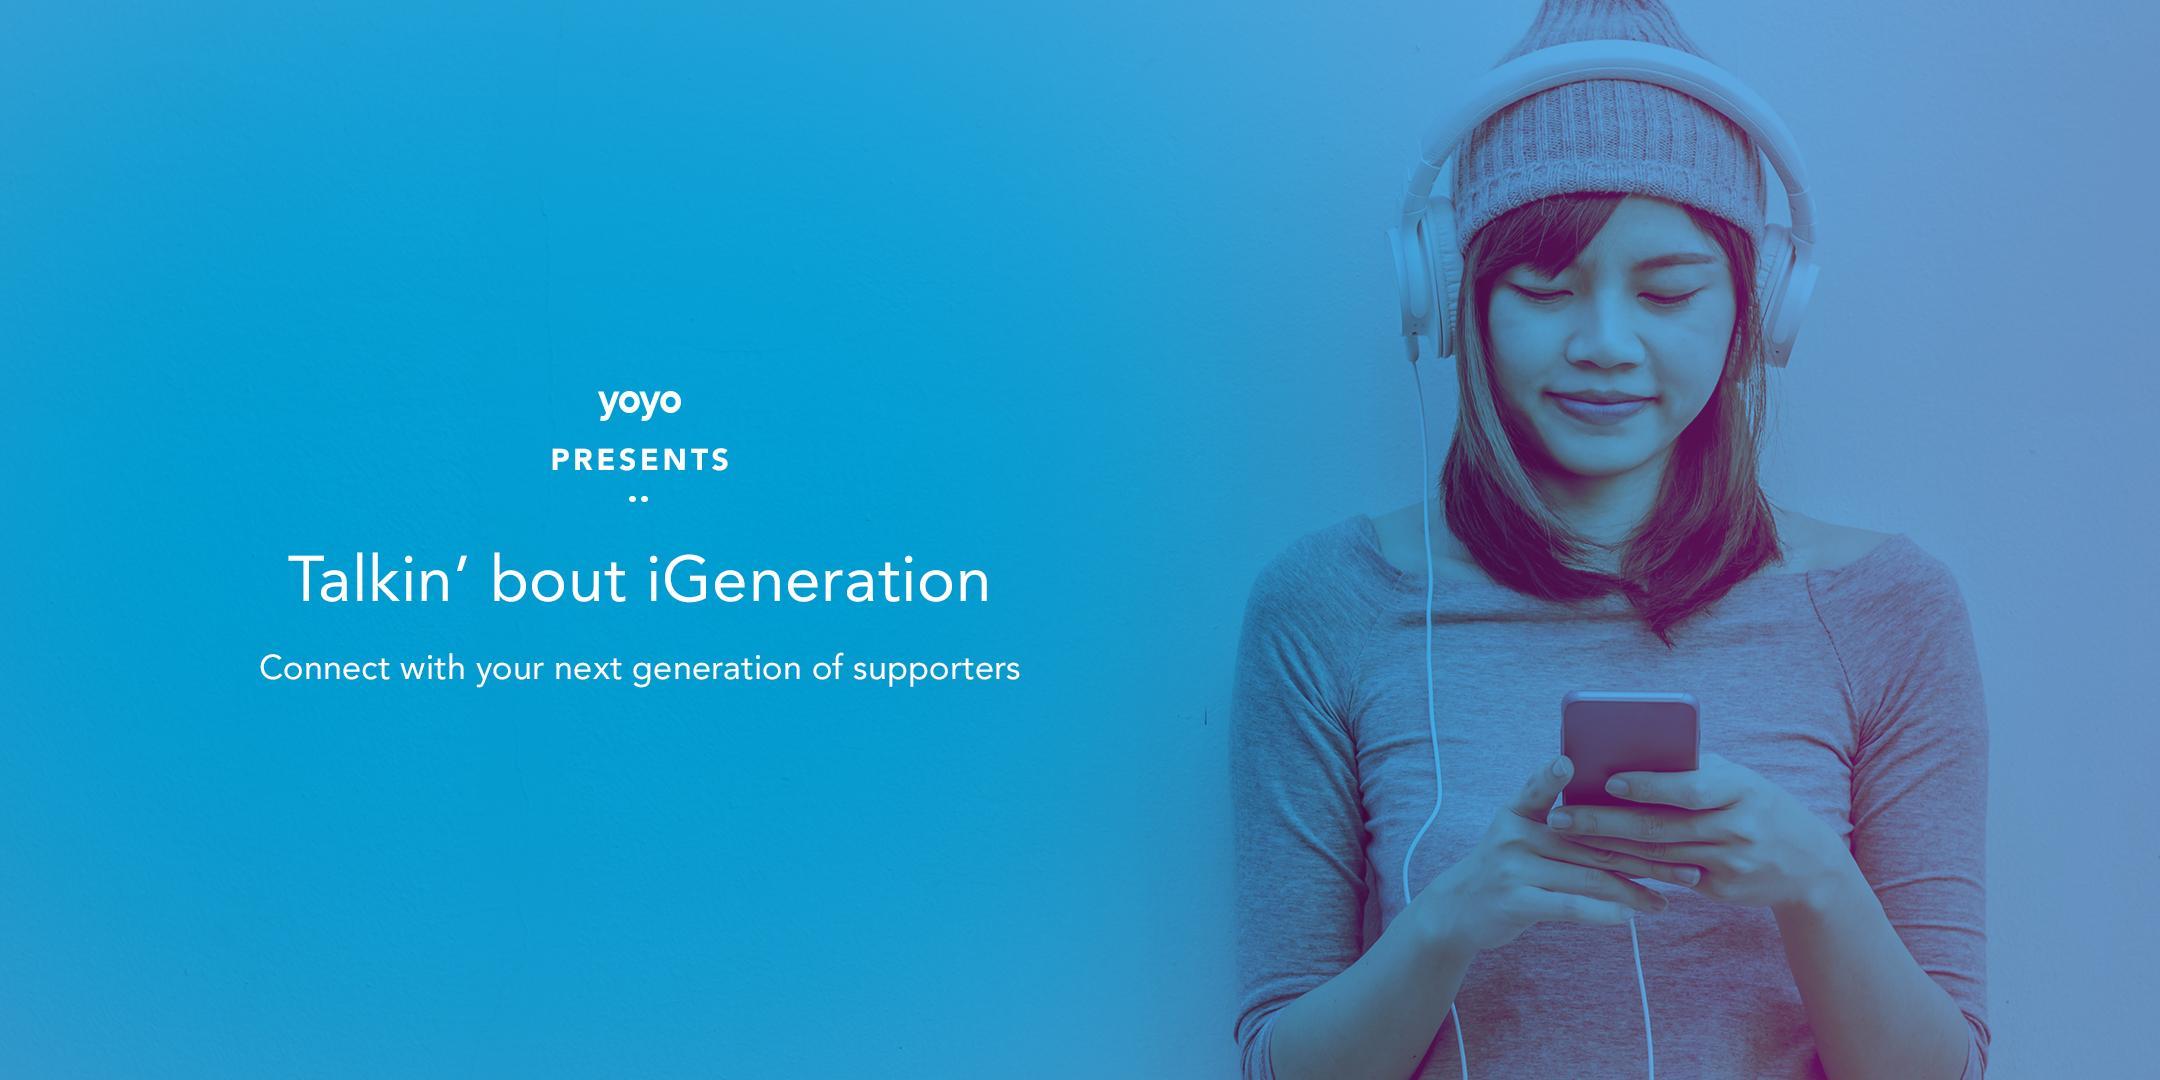 Yoyo Presents: Talkin' bout iGeneration